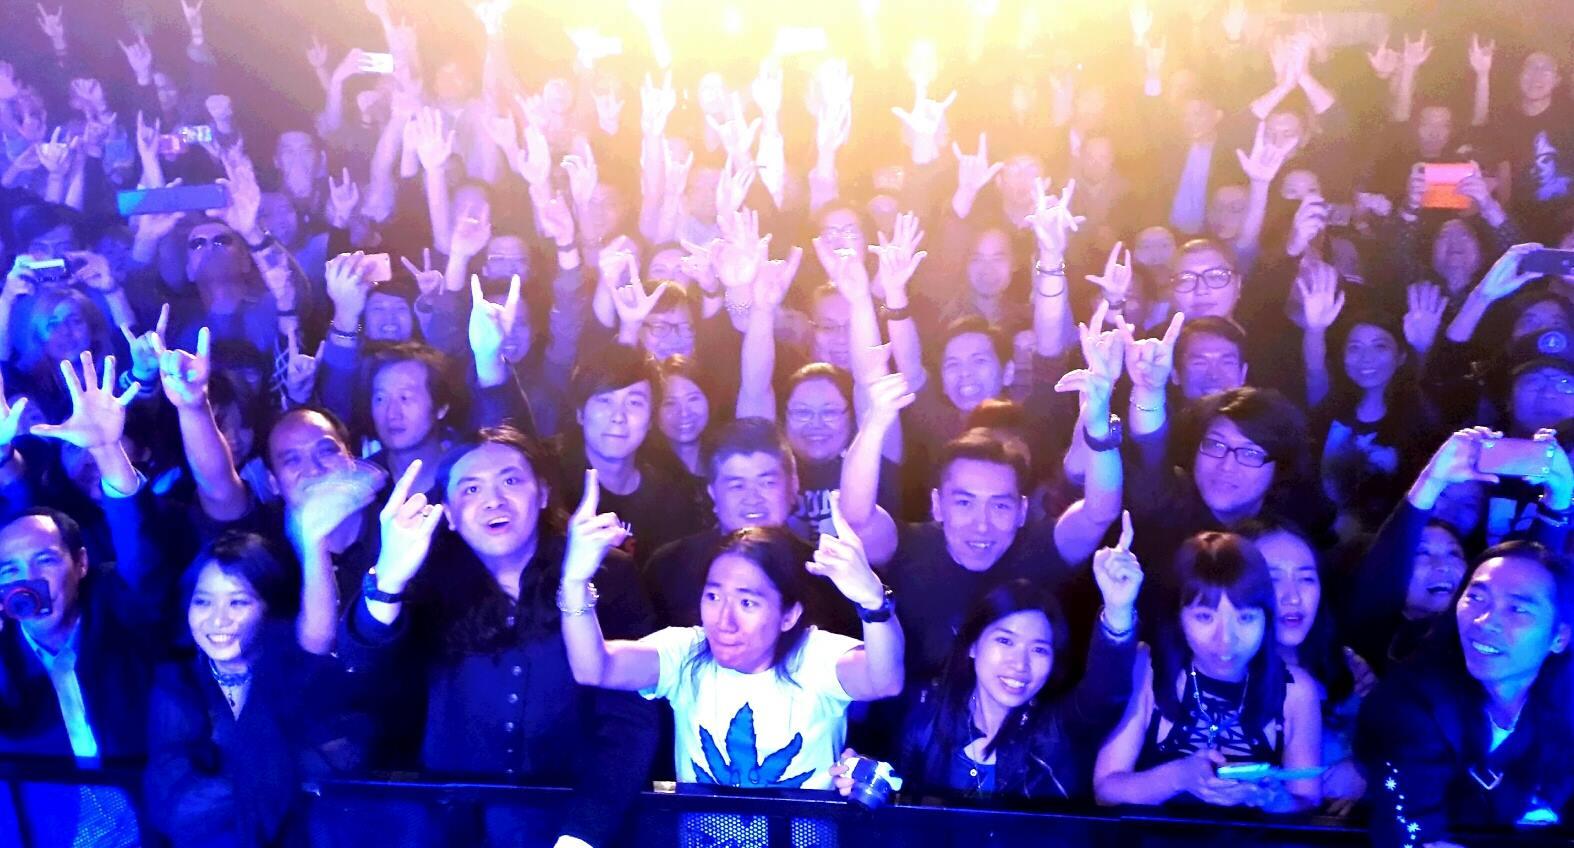 hong kong 27.11